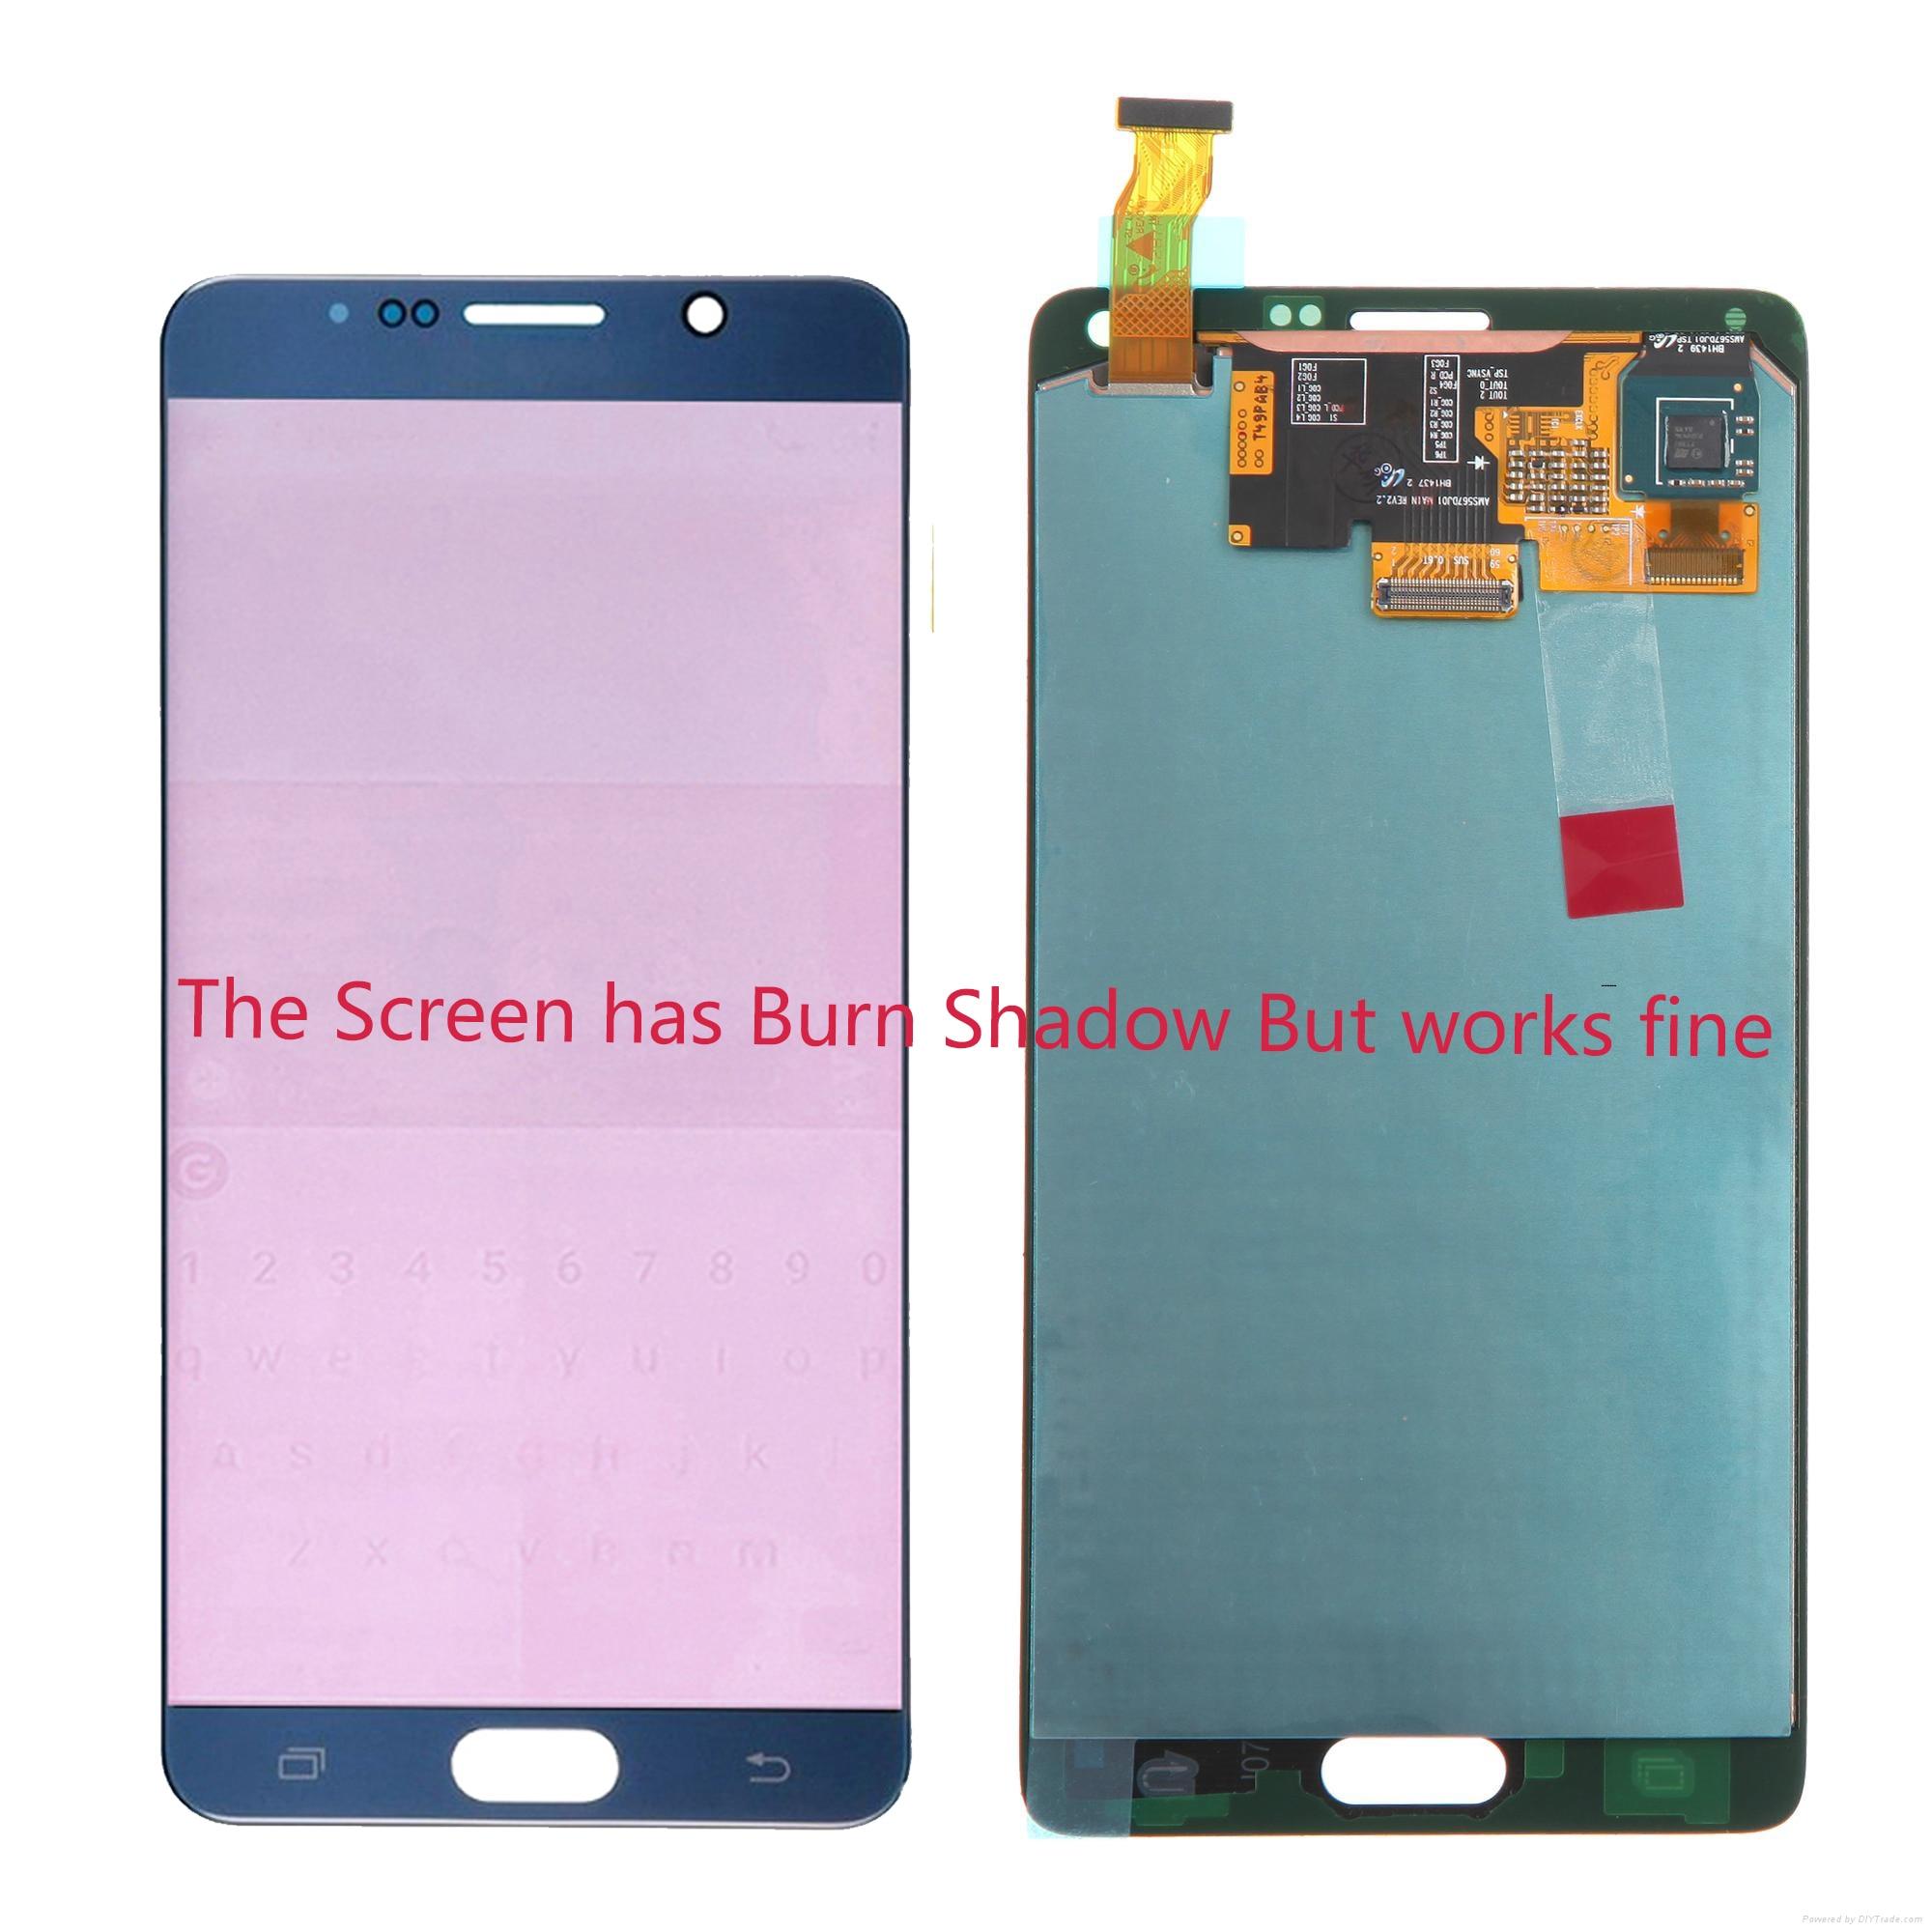 شاشة لمس LCD ، 5.7 إنش ، لهاتف SAMSUNG GALAXY Note 4 N910A N910F N910C ، Burn Shadow AMOLED